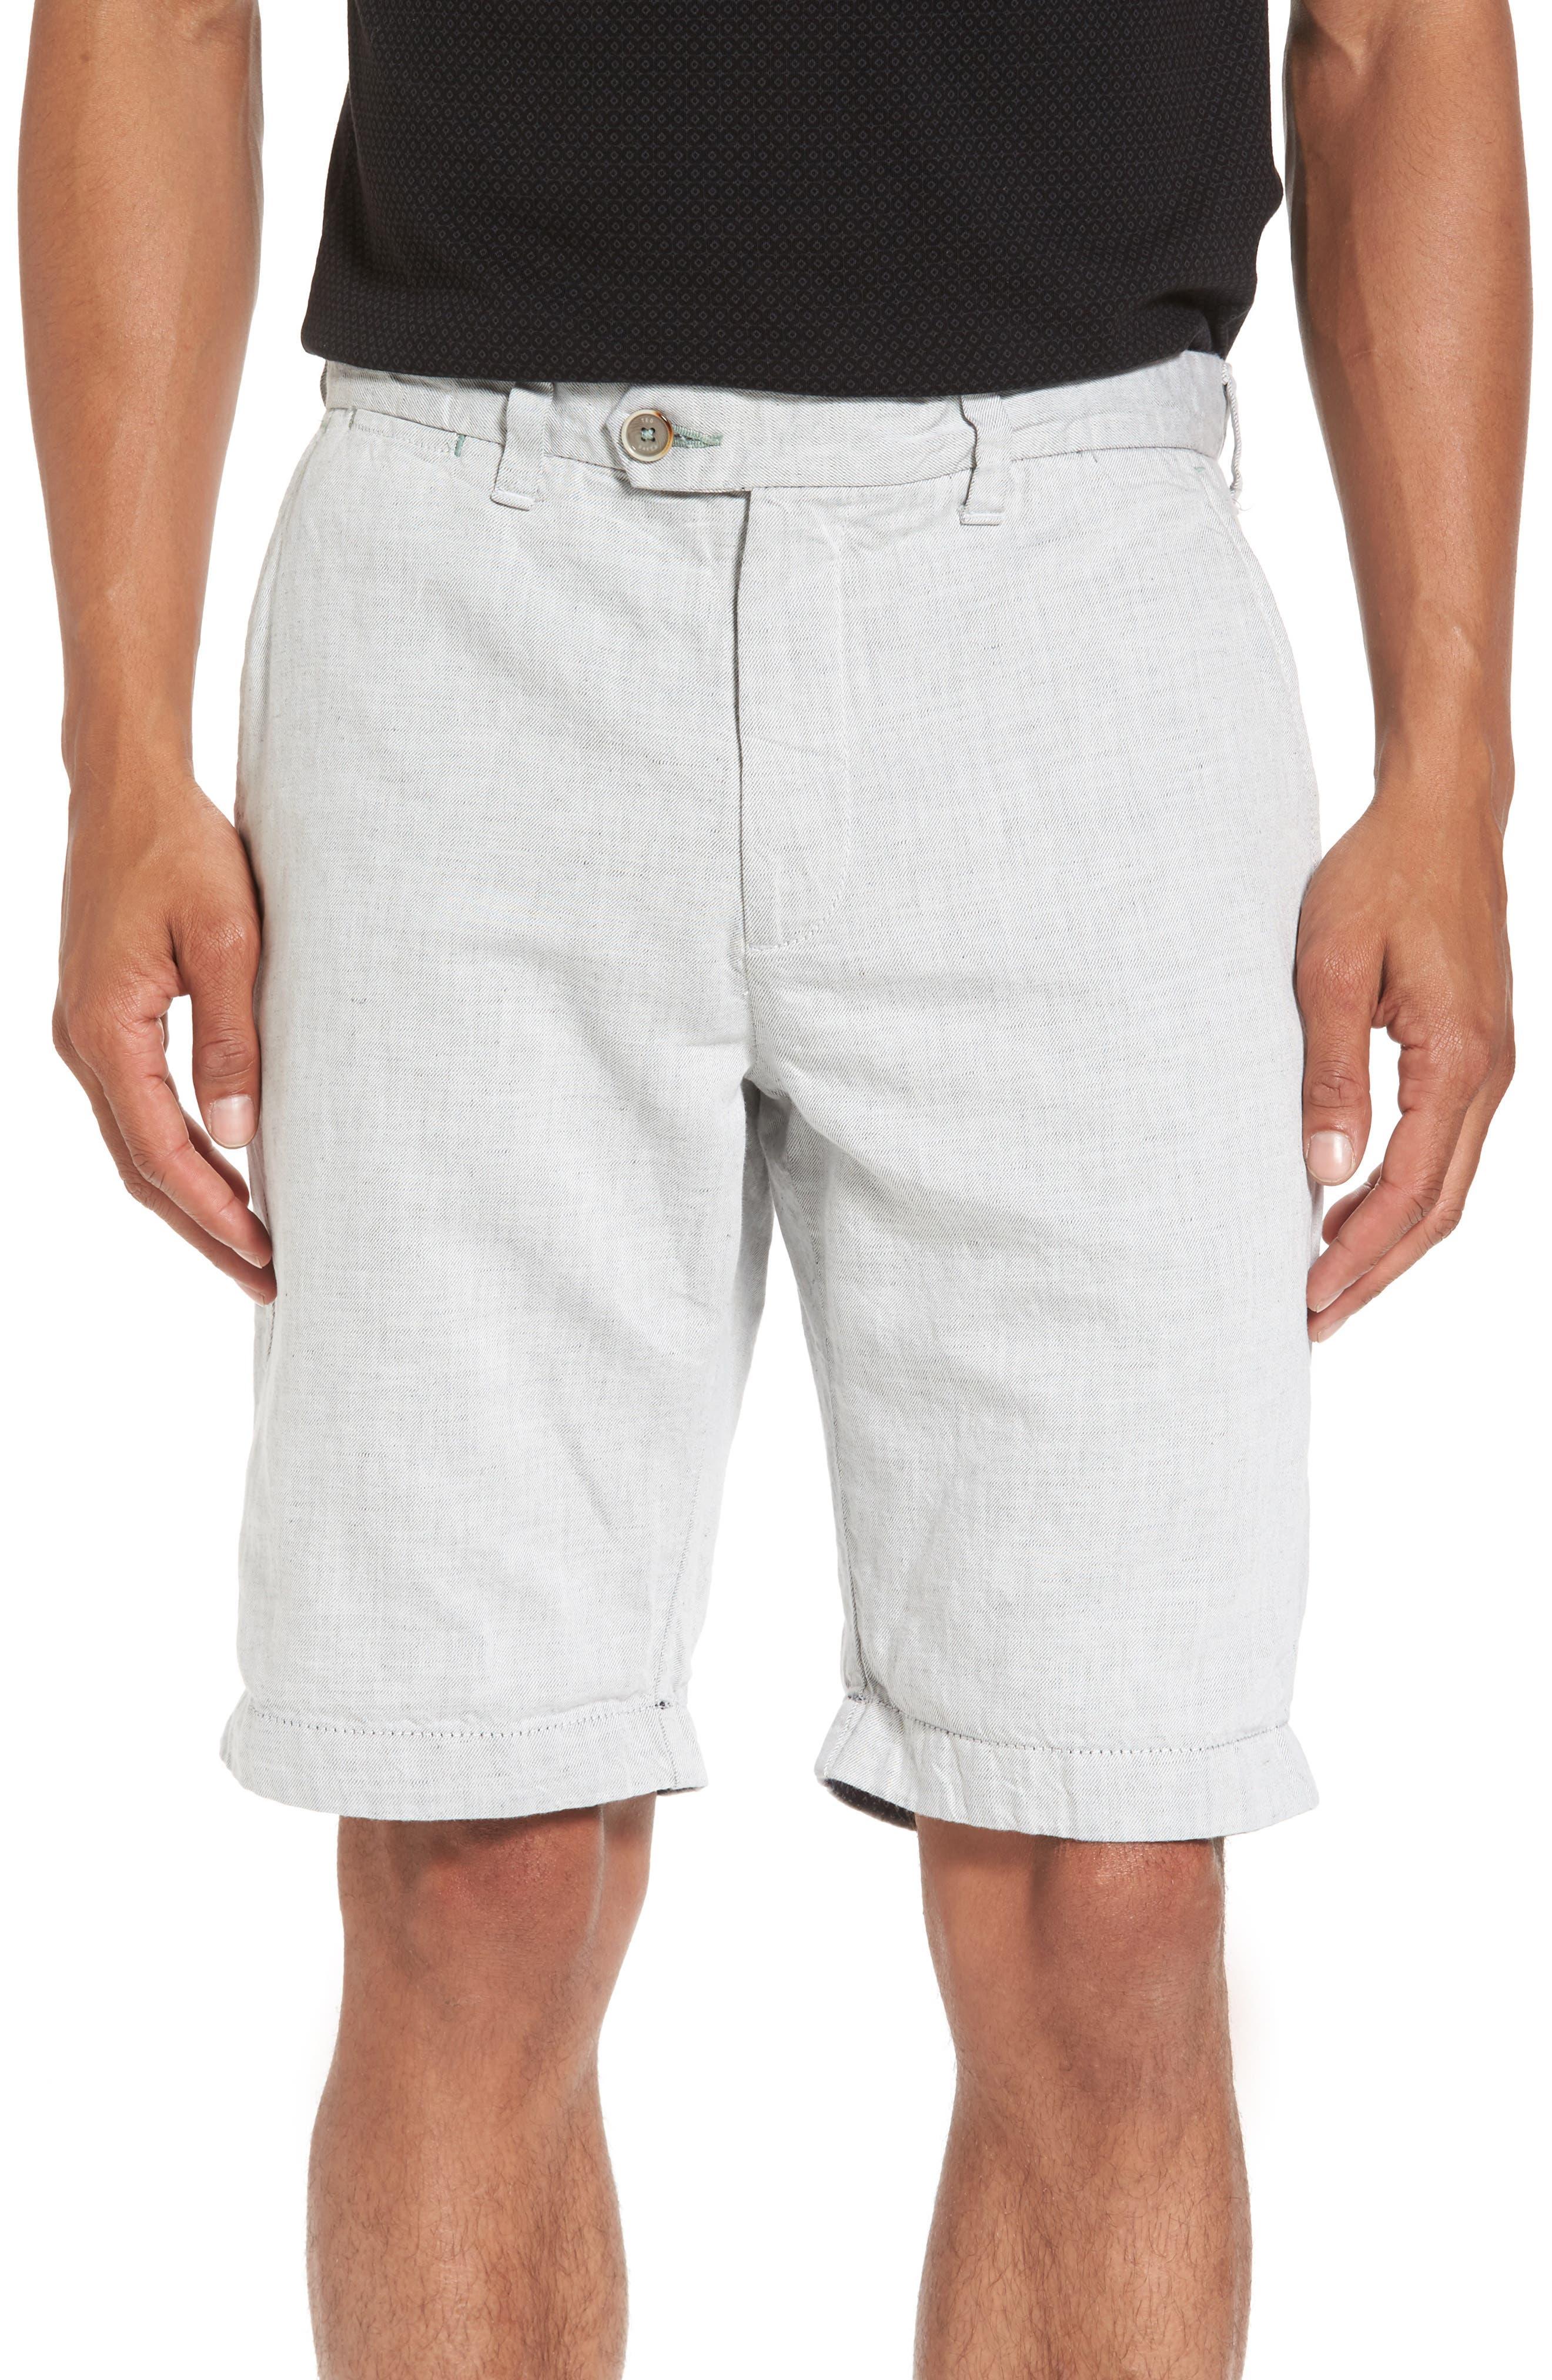 Frisho Cuff Denim Shorts,                             Main thumbnail 1, color,                             Light Grey